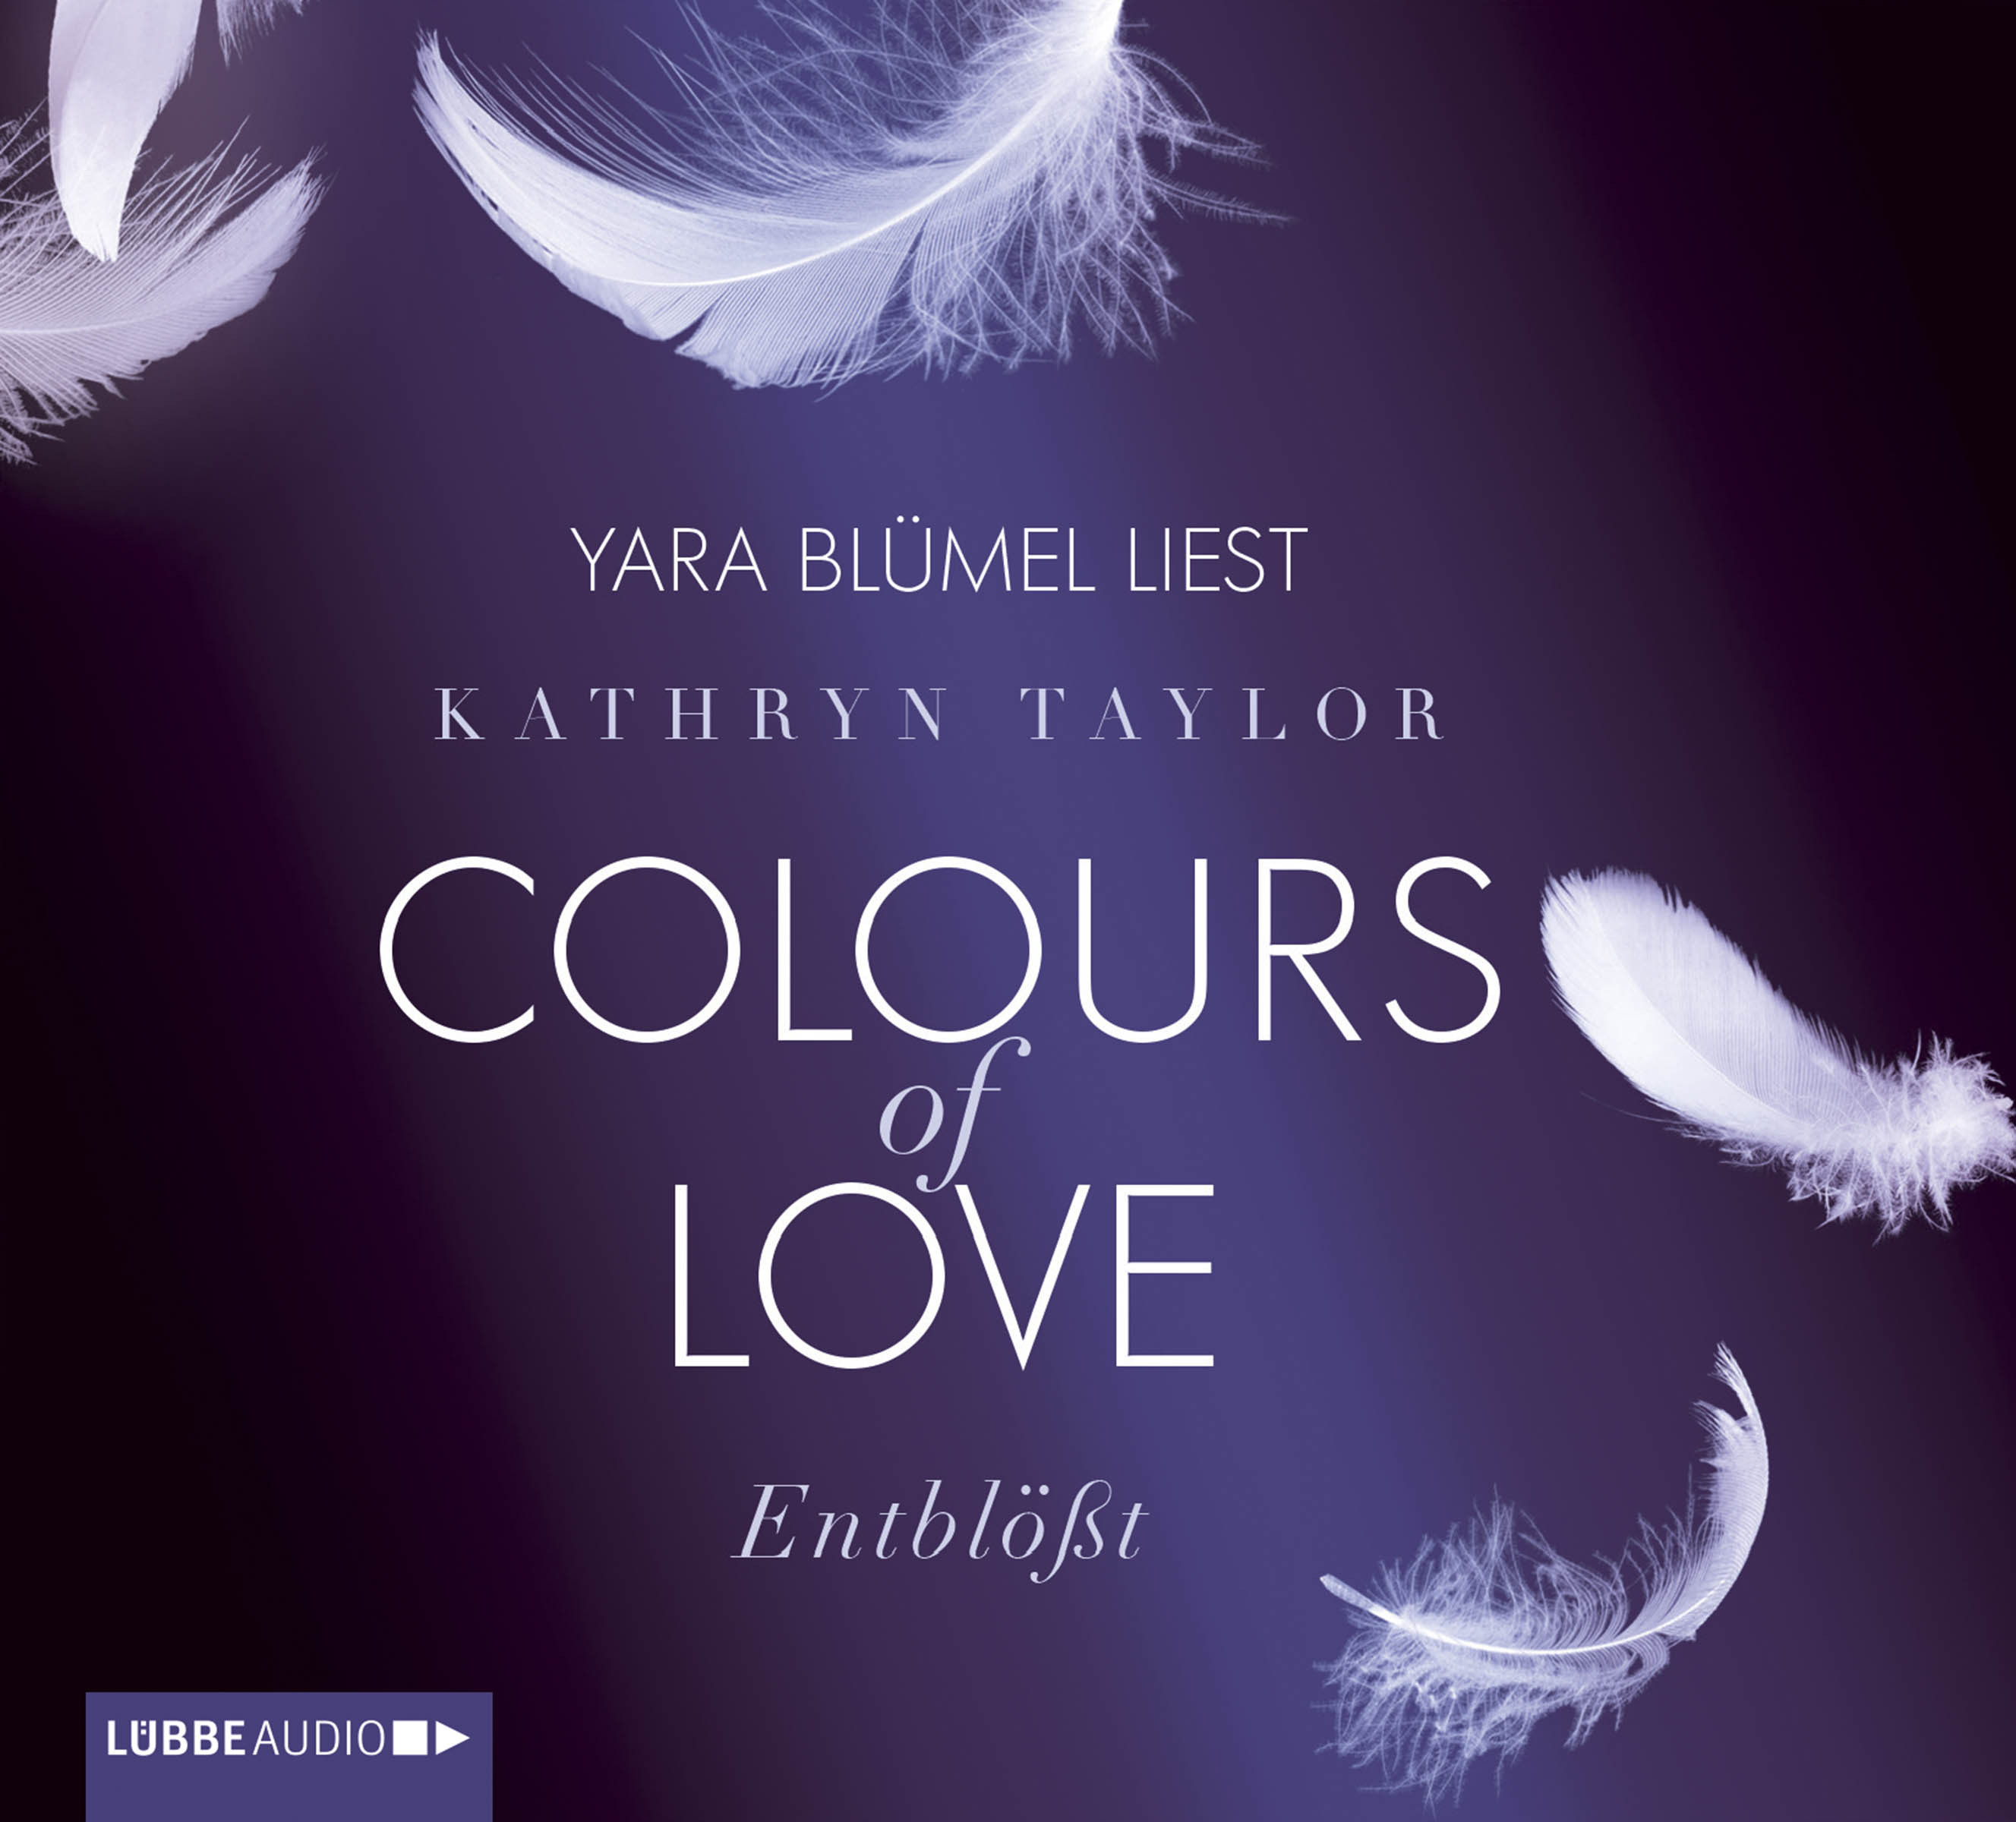 Kathryn Taylor - Colours of Love - Band 2: Entblößt